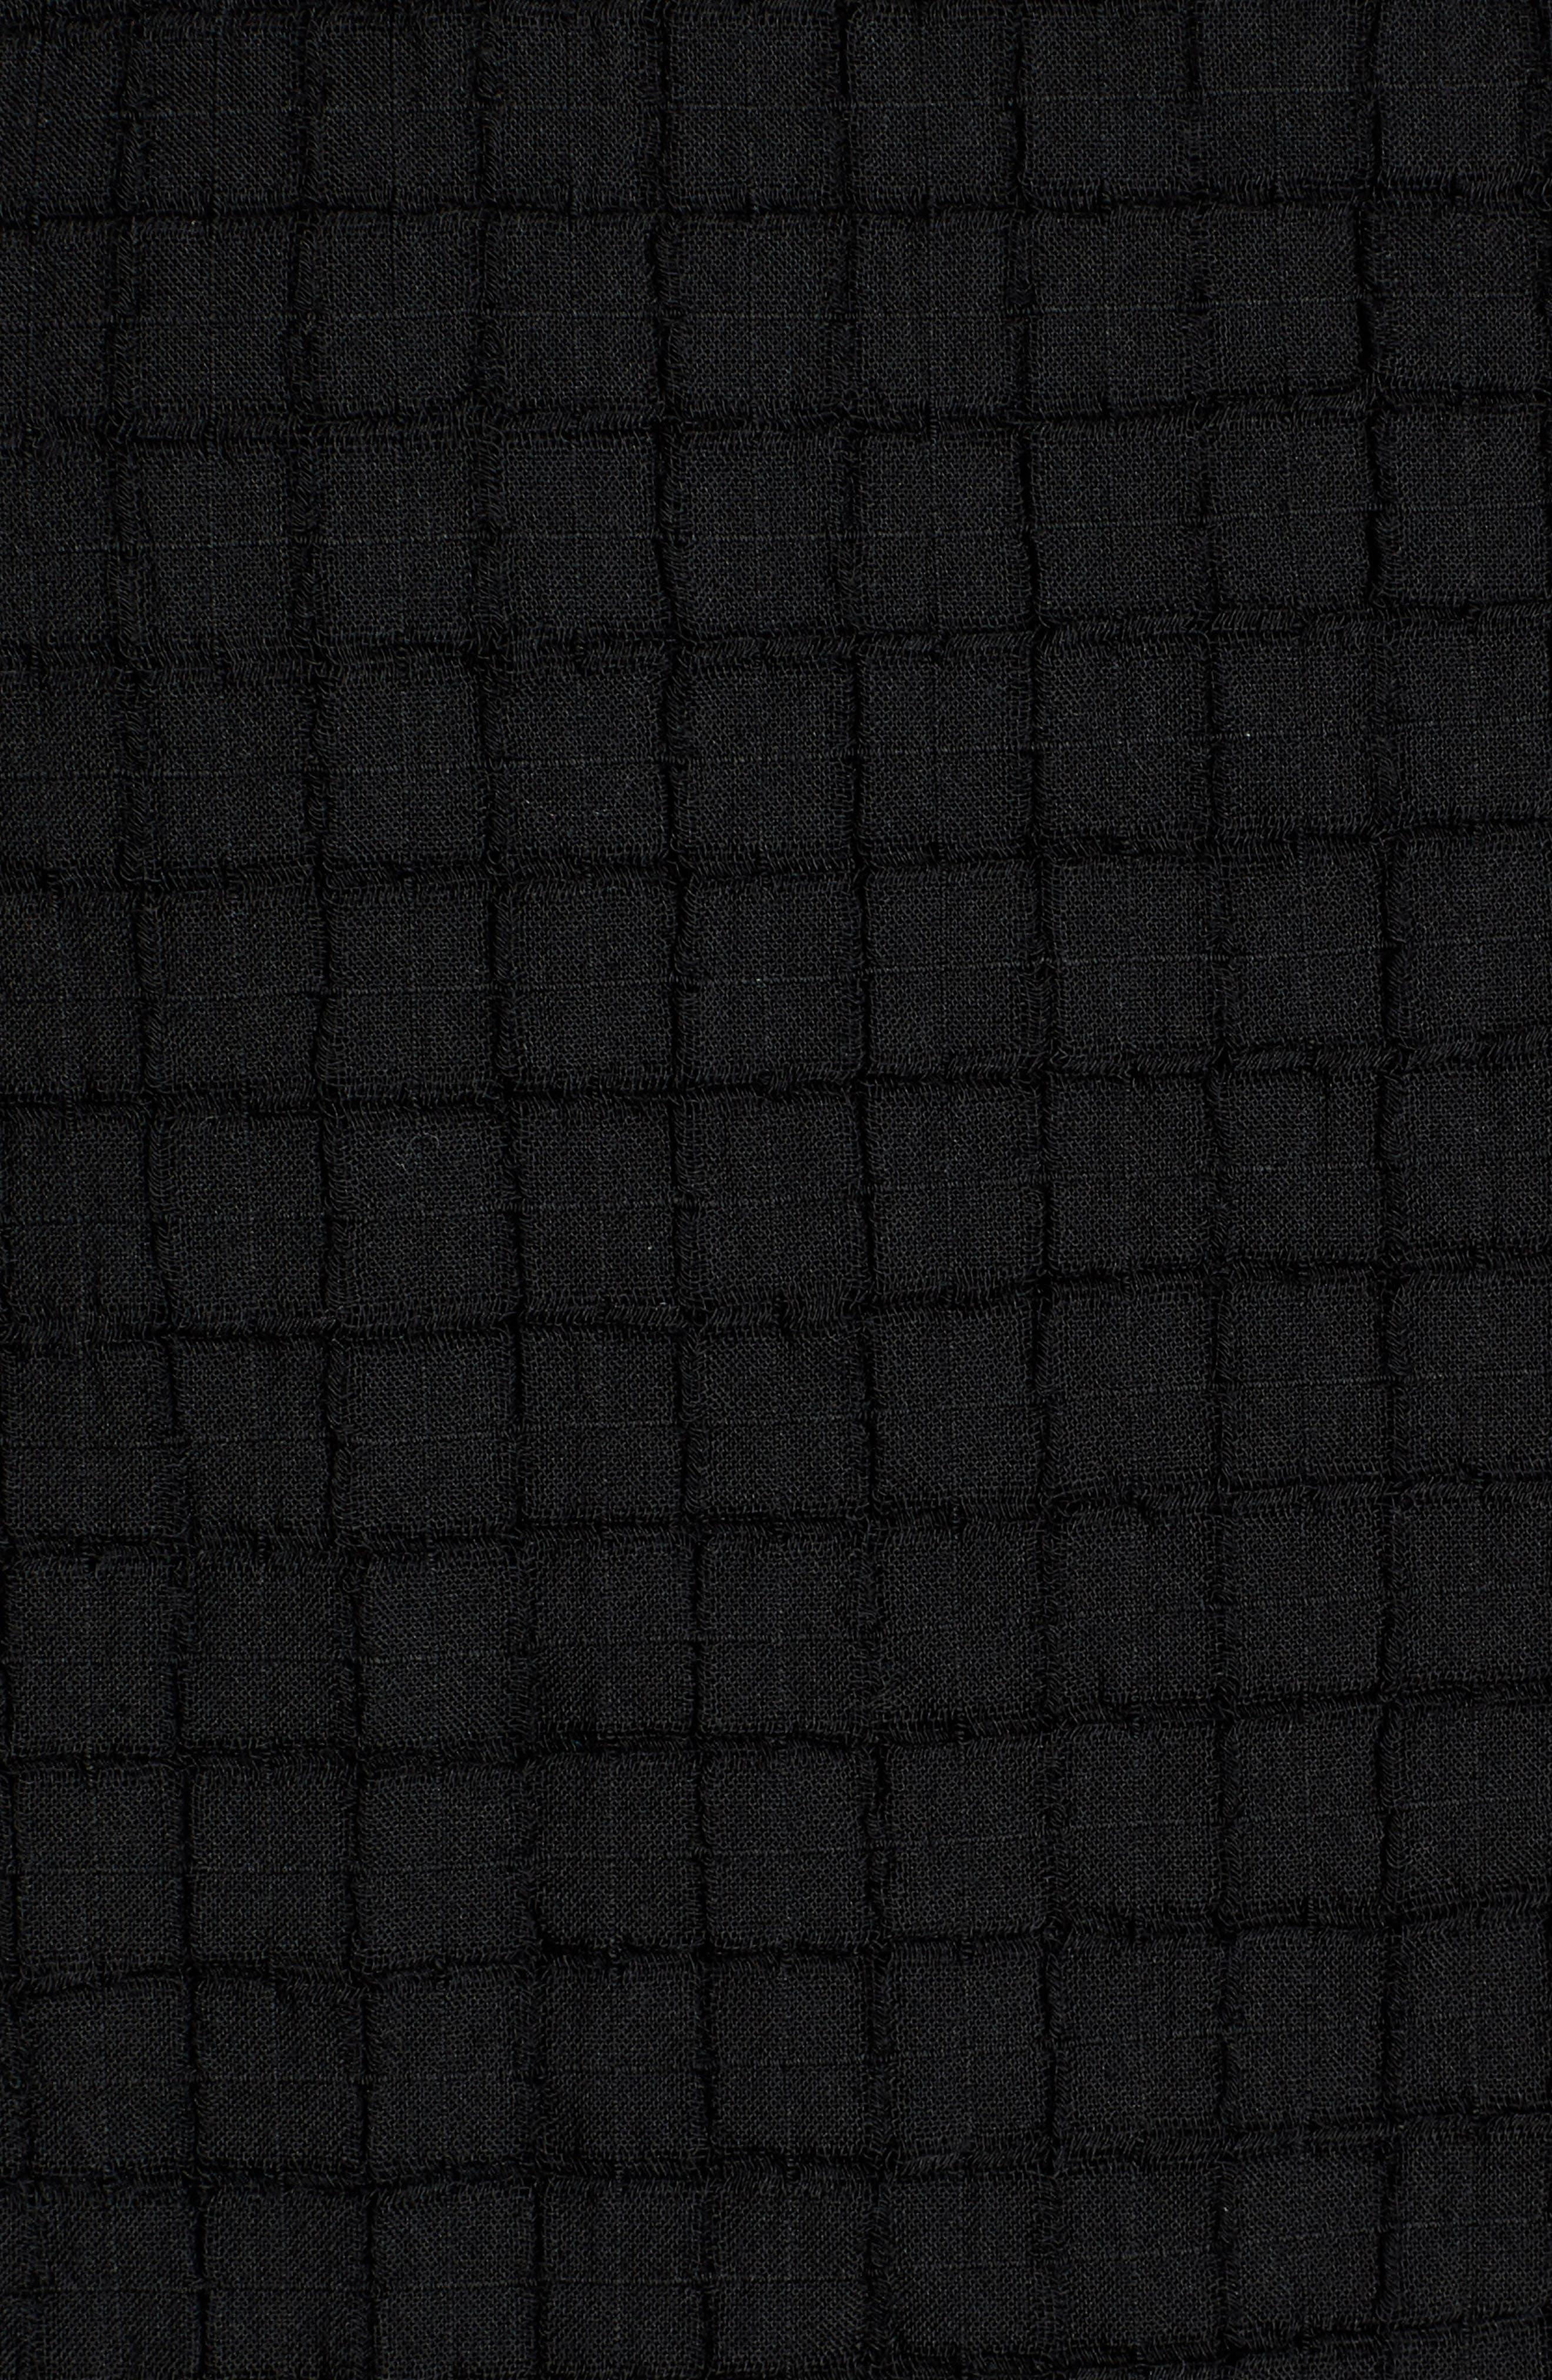 Stretch Organic Cotton Top,                             Alternate thumbnail 6, color,                             001